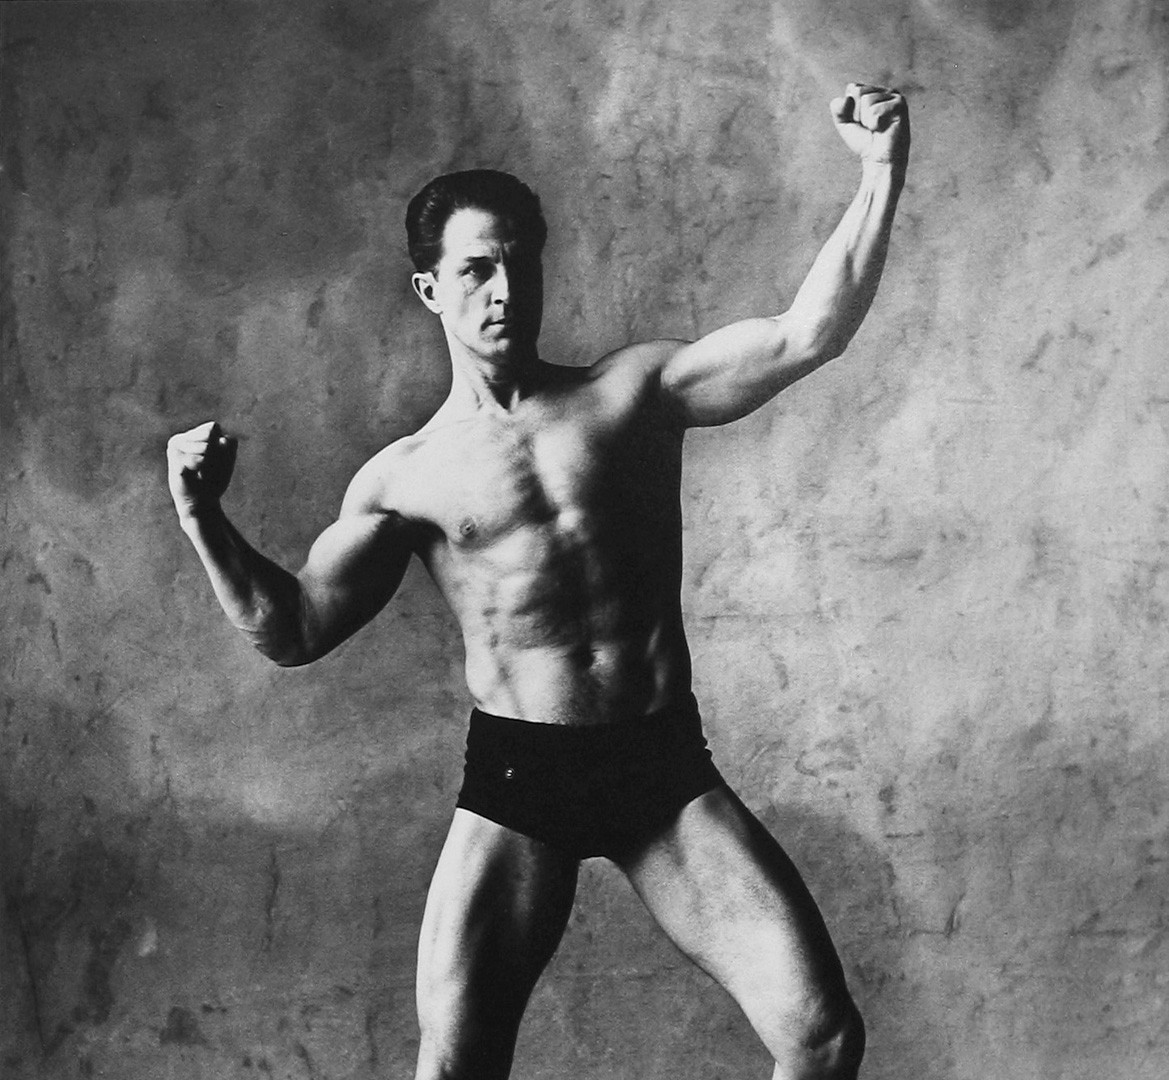 Irving Penn, Muscle Builder (A), New York, 1951